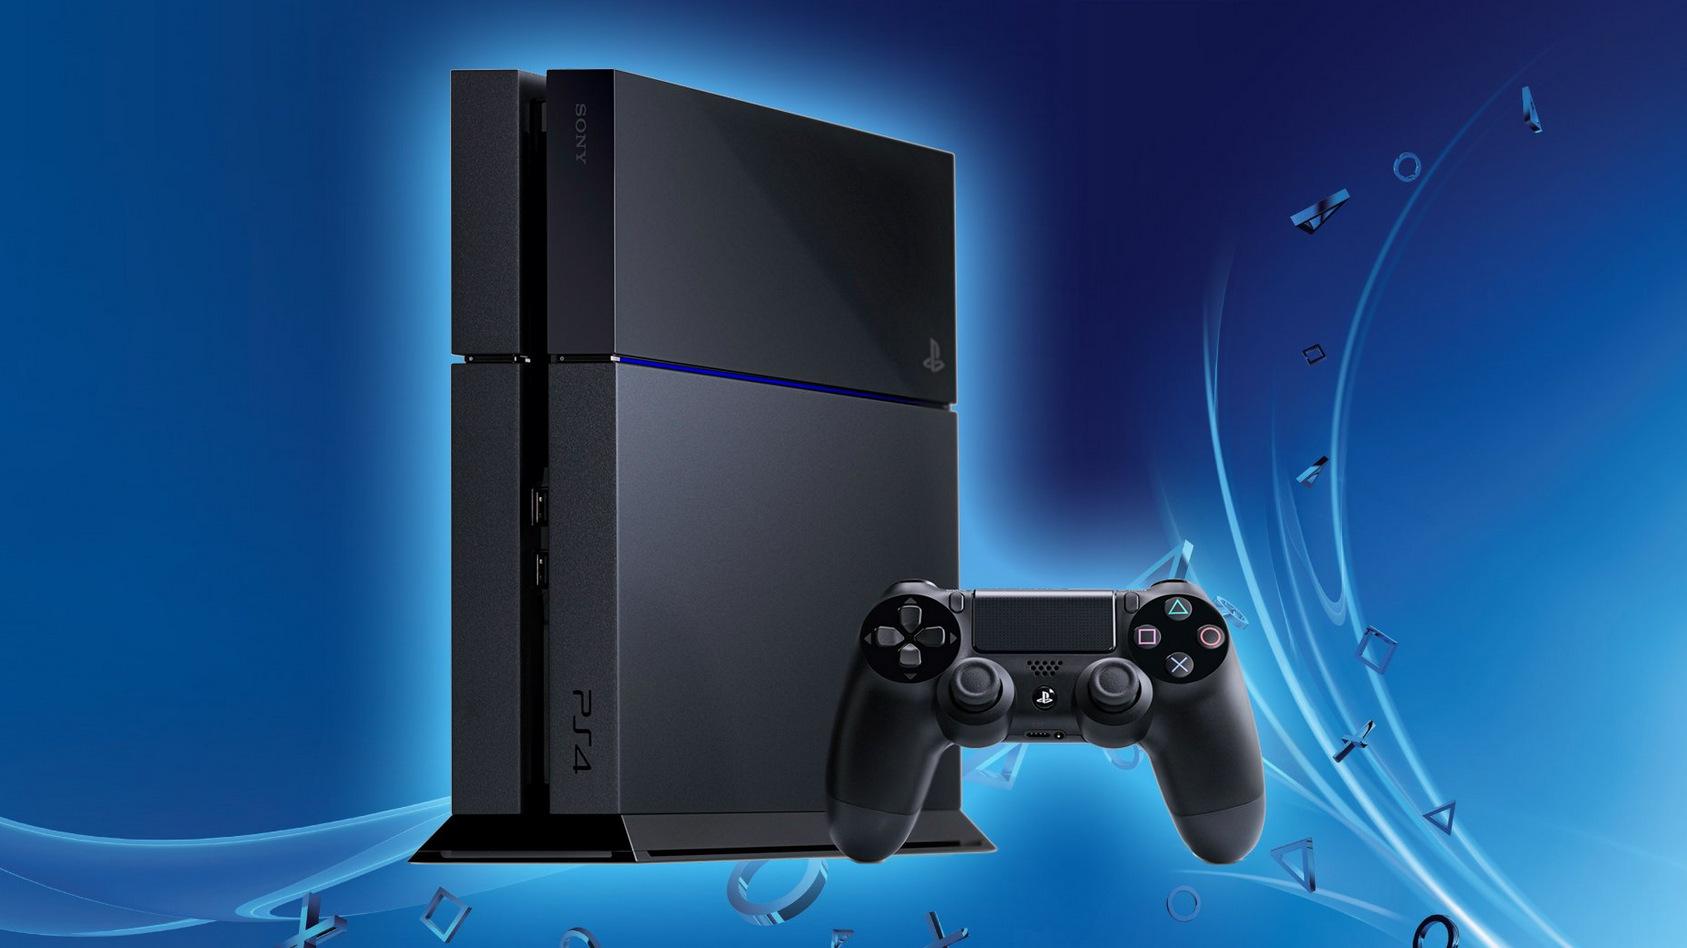 Playstation 4 Pirata Pirateria Copia Juegos Gratis 1 Tec